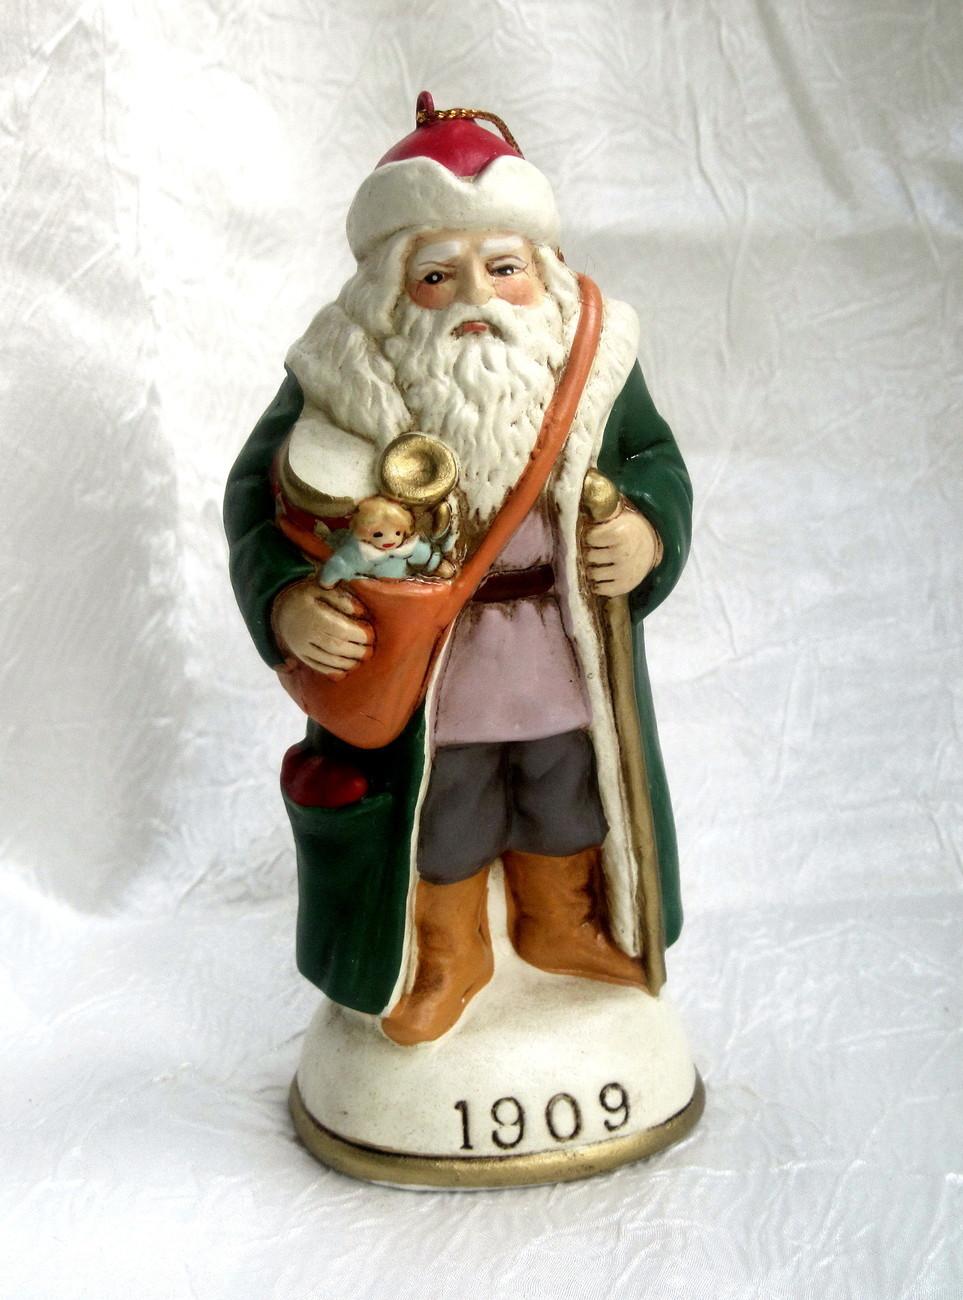 Christmas eve inc santa claus figurine ornament